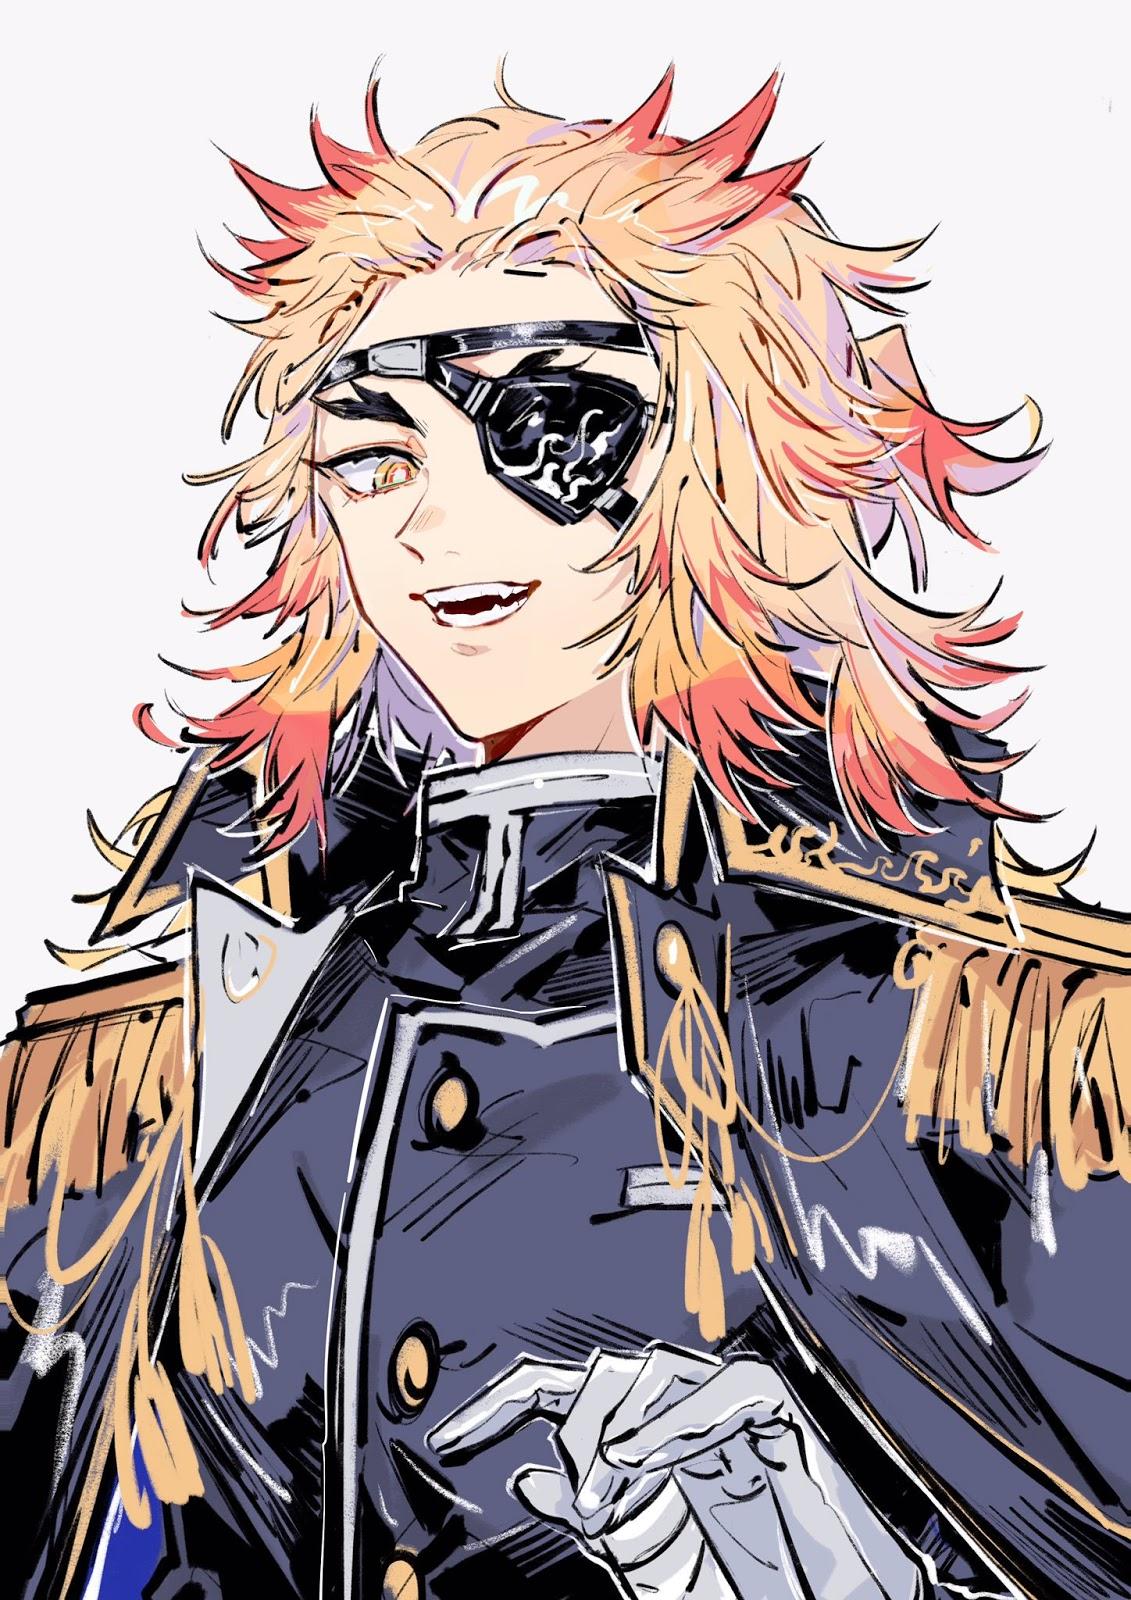 Fan Art Kimetsu No Yaiba military uniform - BlogfanArt